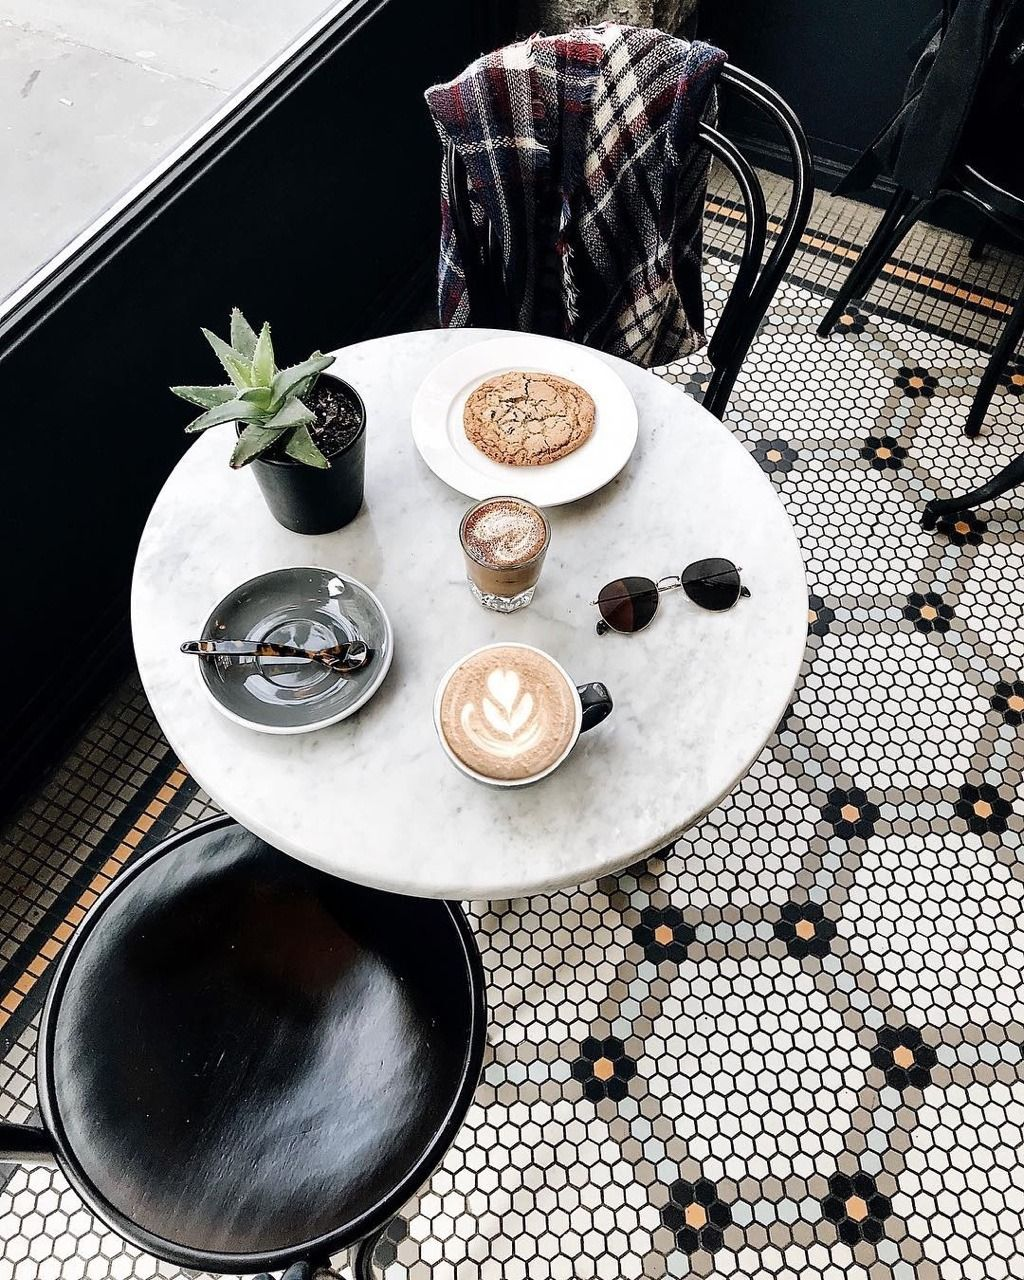 25+ Vermont artisan coffee roasters inspirations